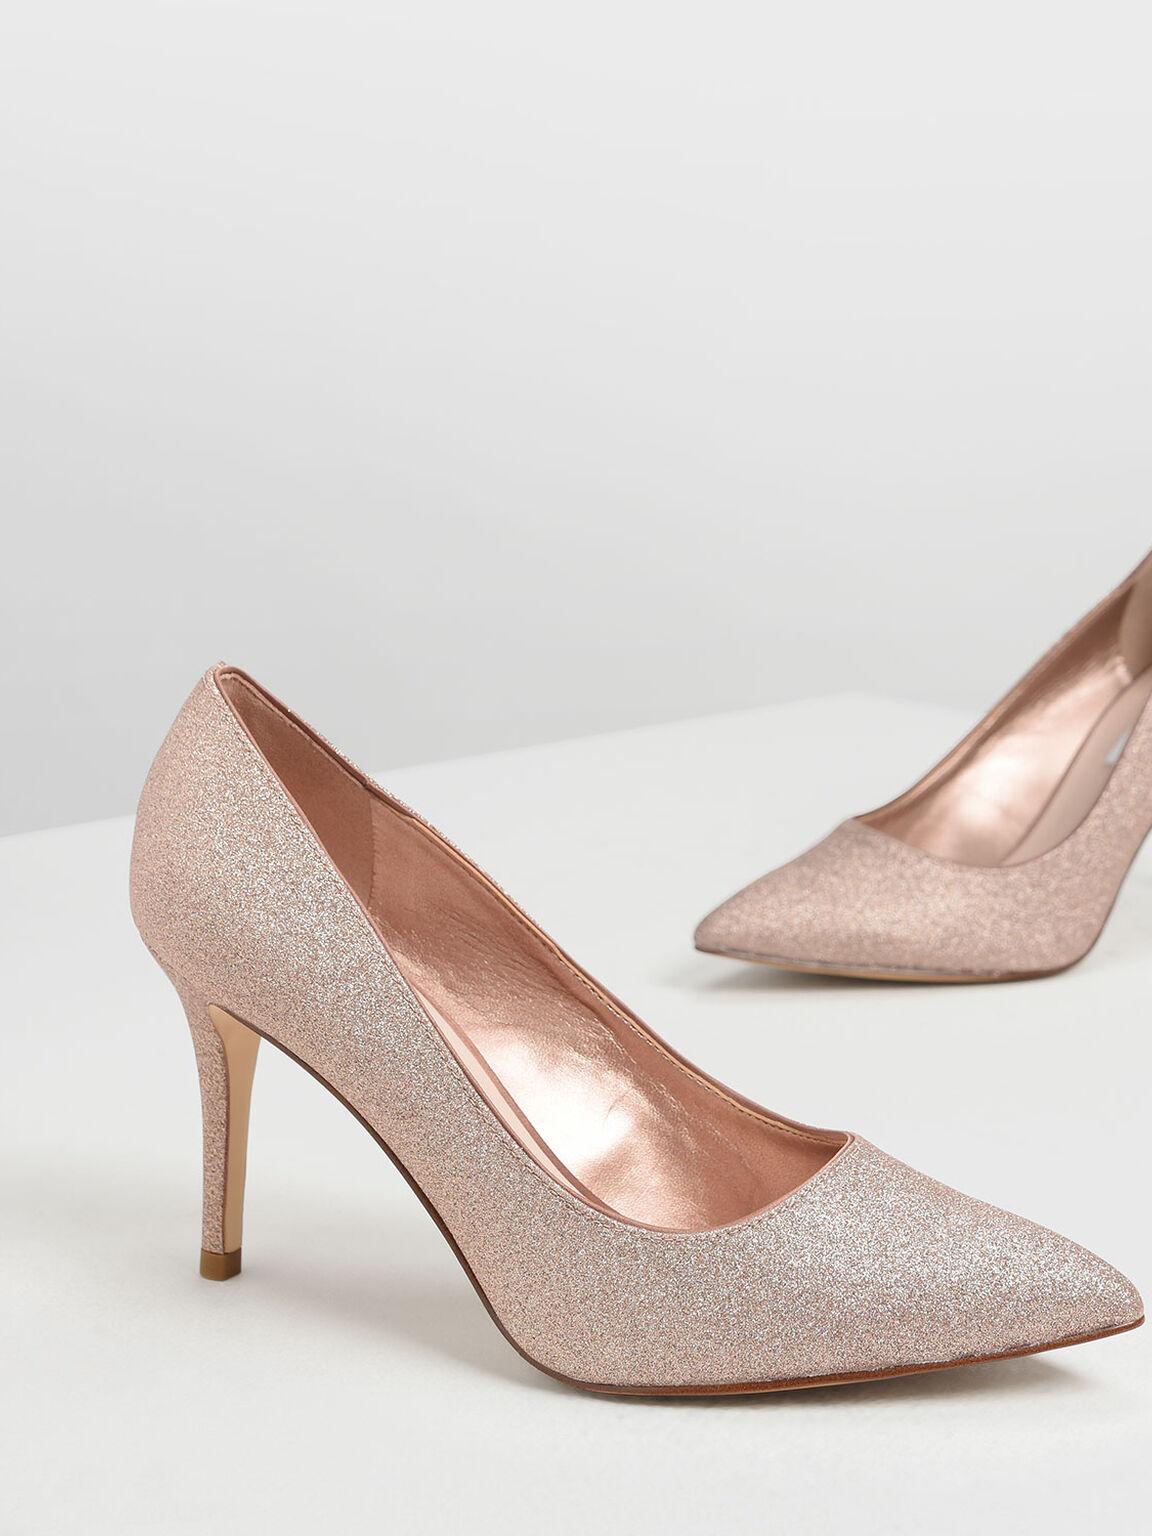 Glitter Pumps, Rose Gold, hi-res